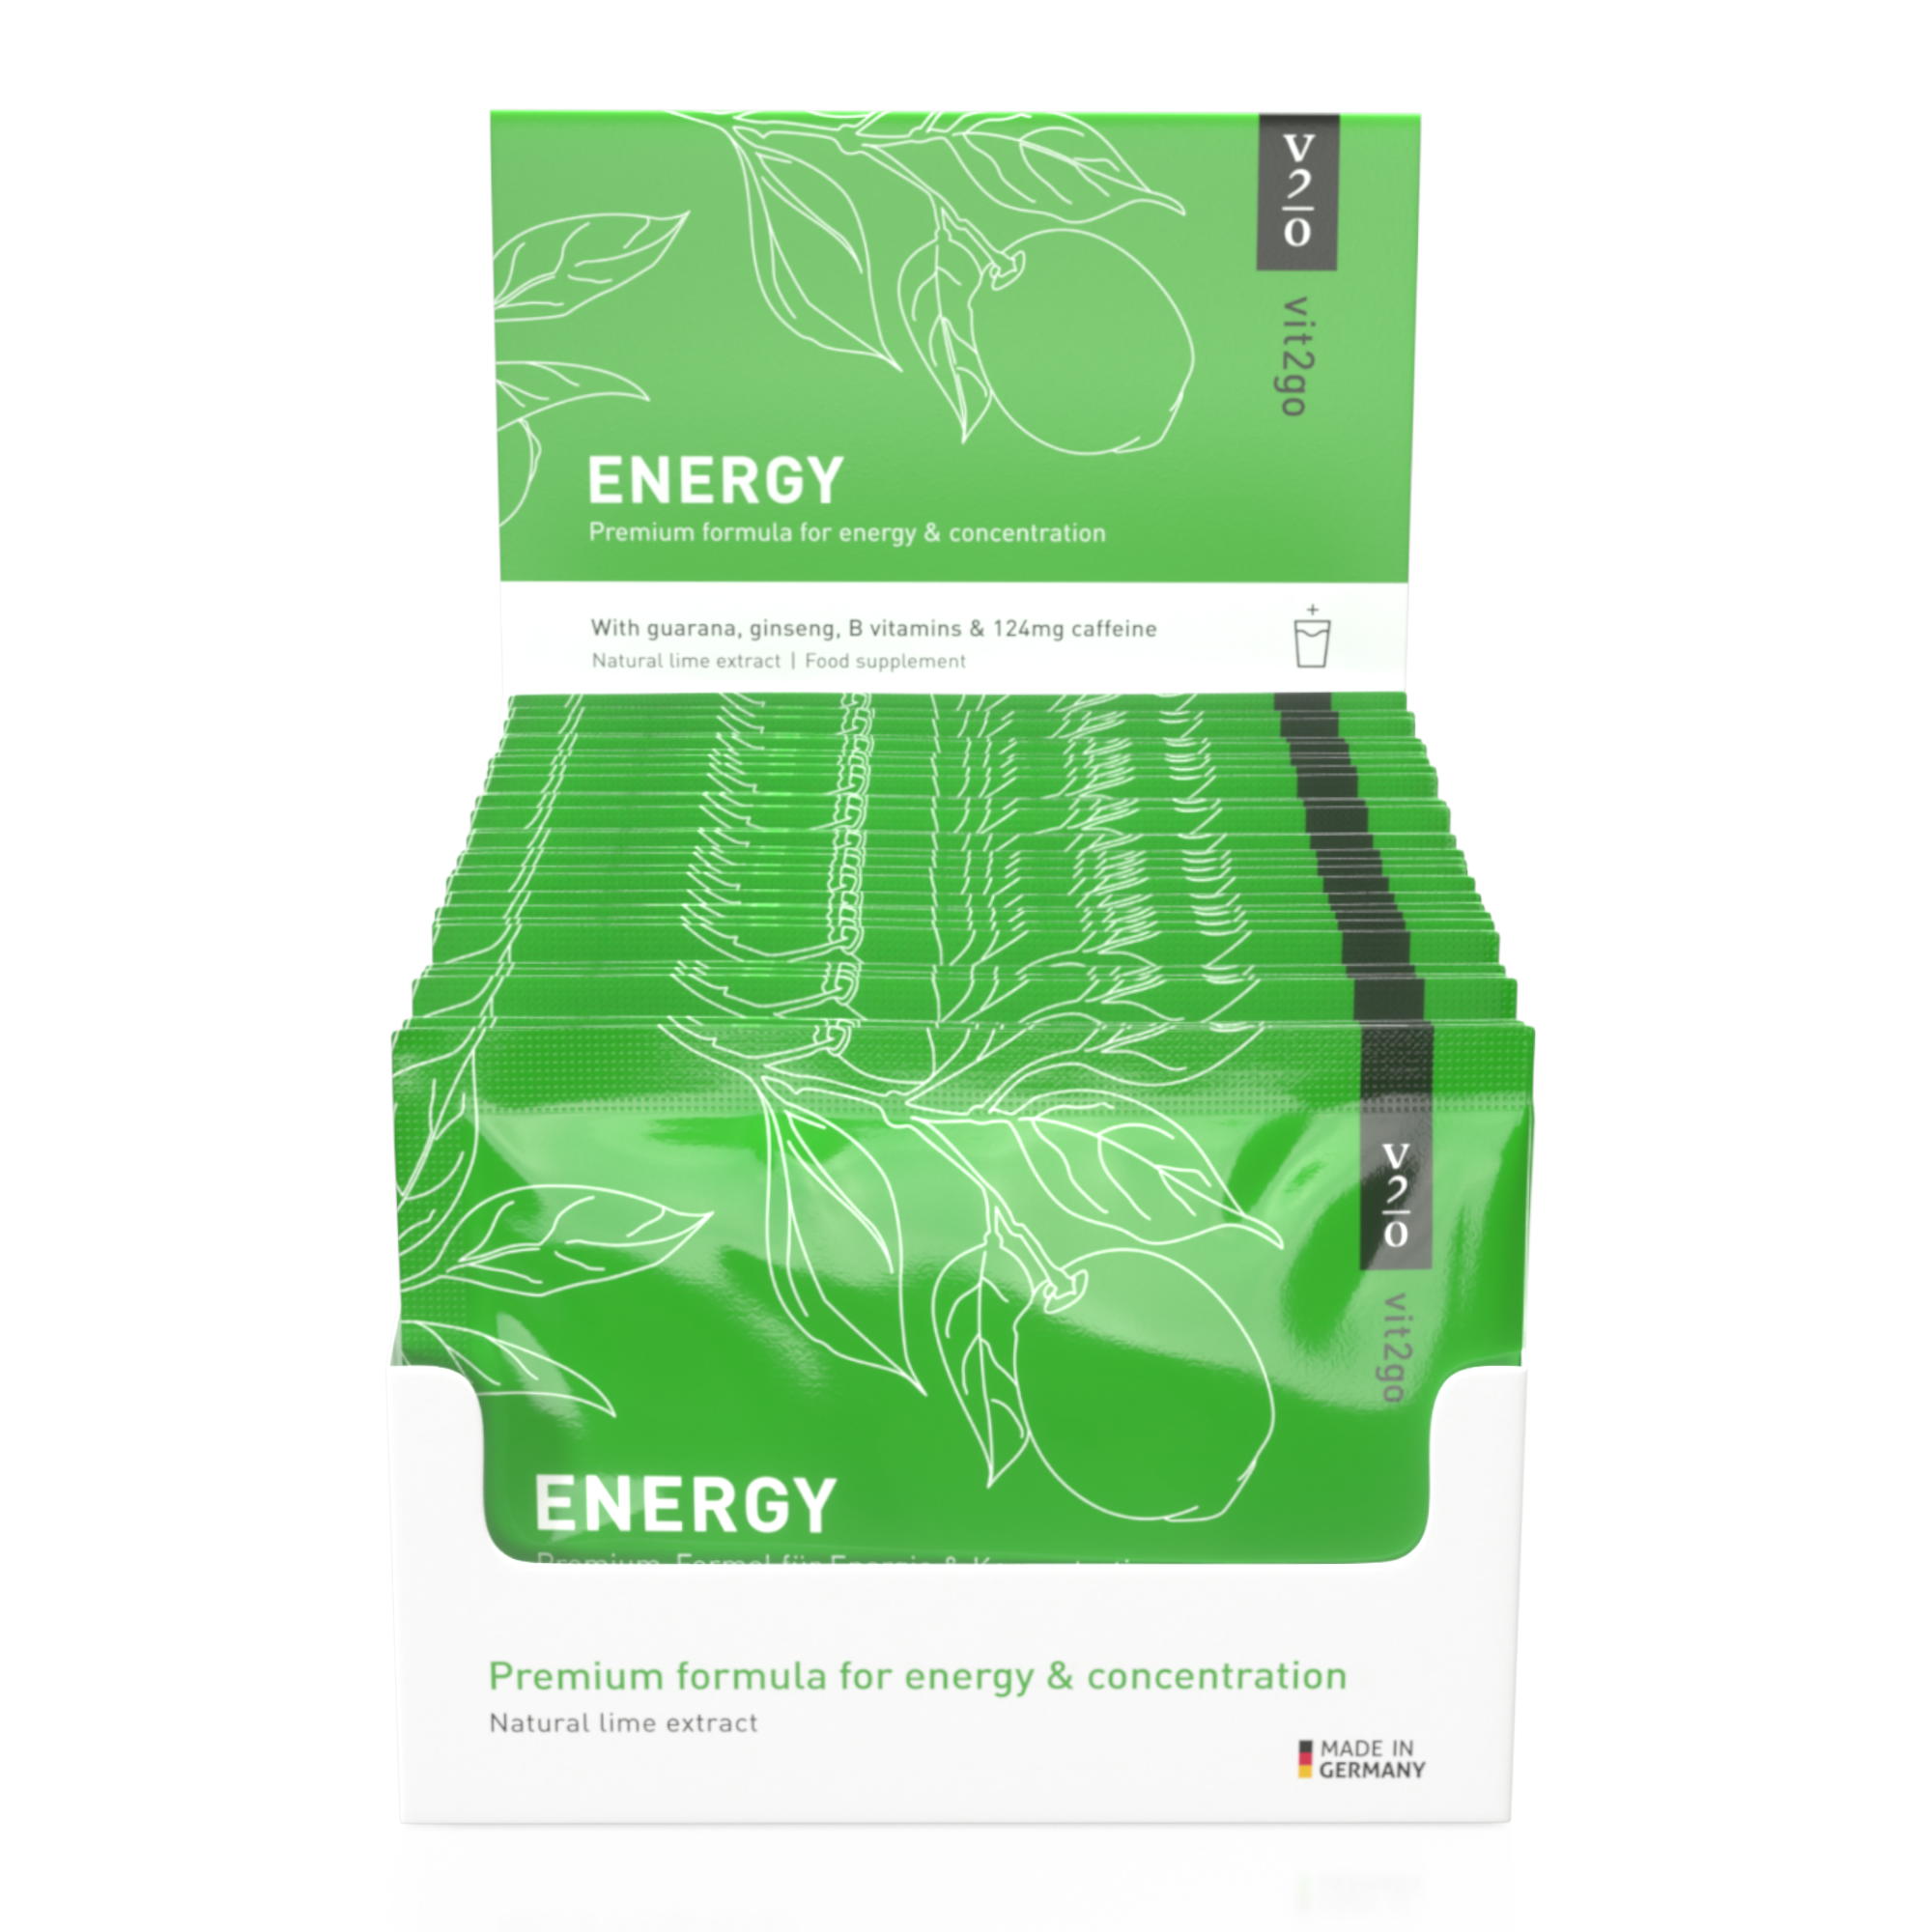 ENERGY 30-PACK